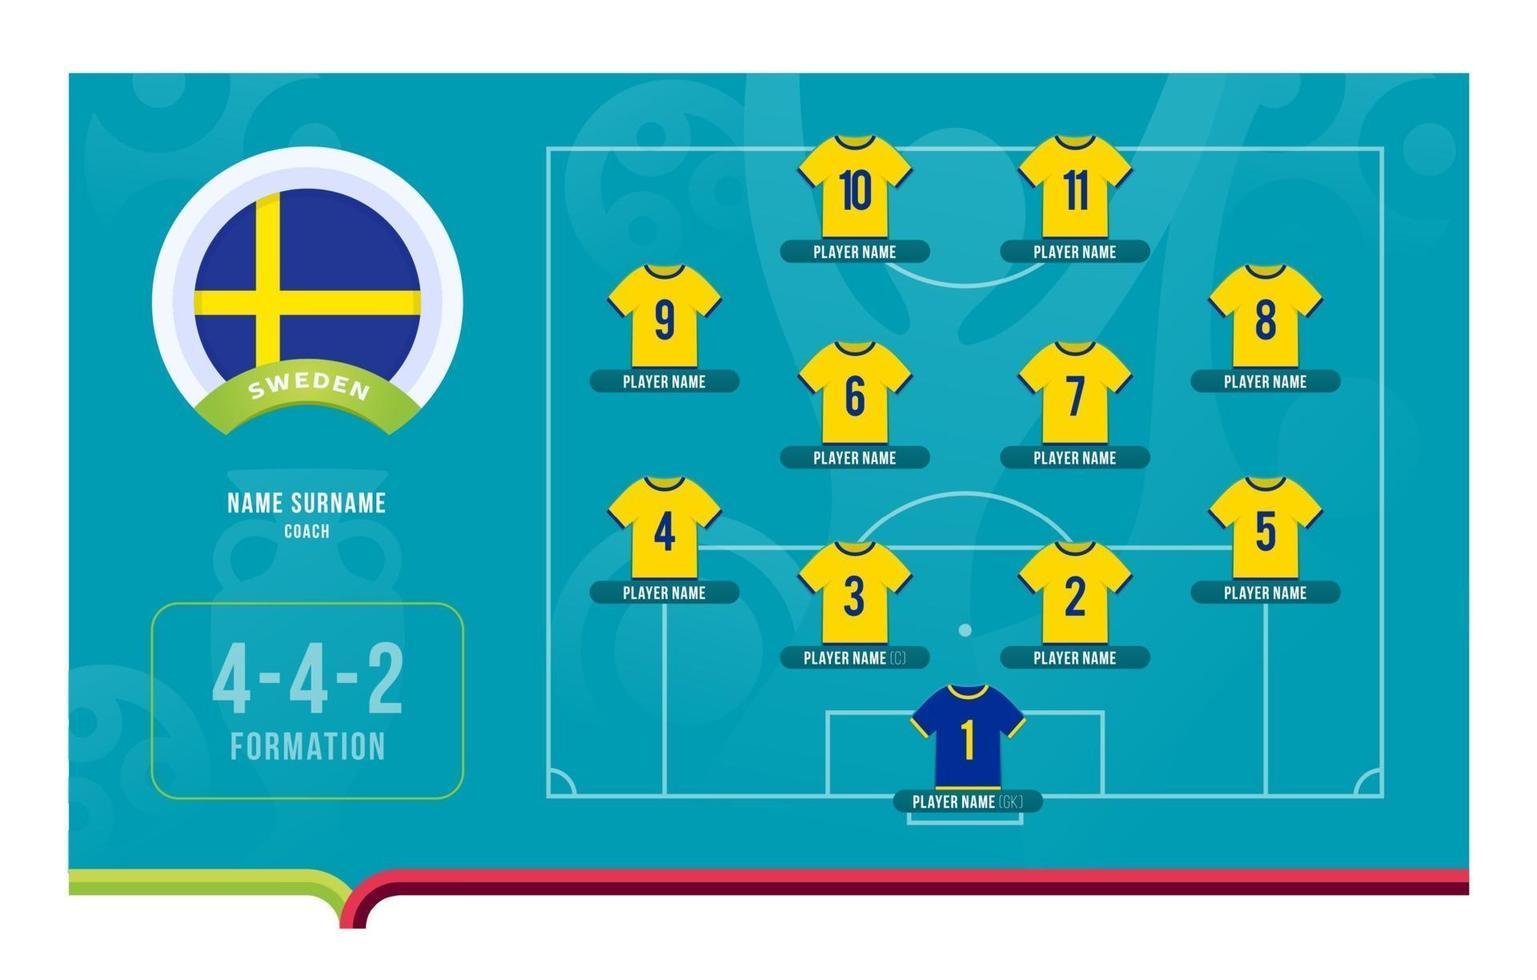 Sweden line-up Football tournament final stage vector illustration